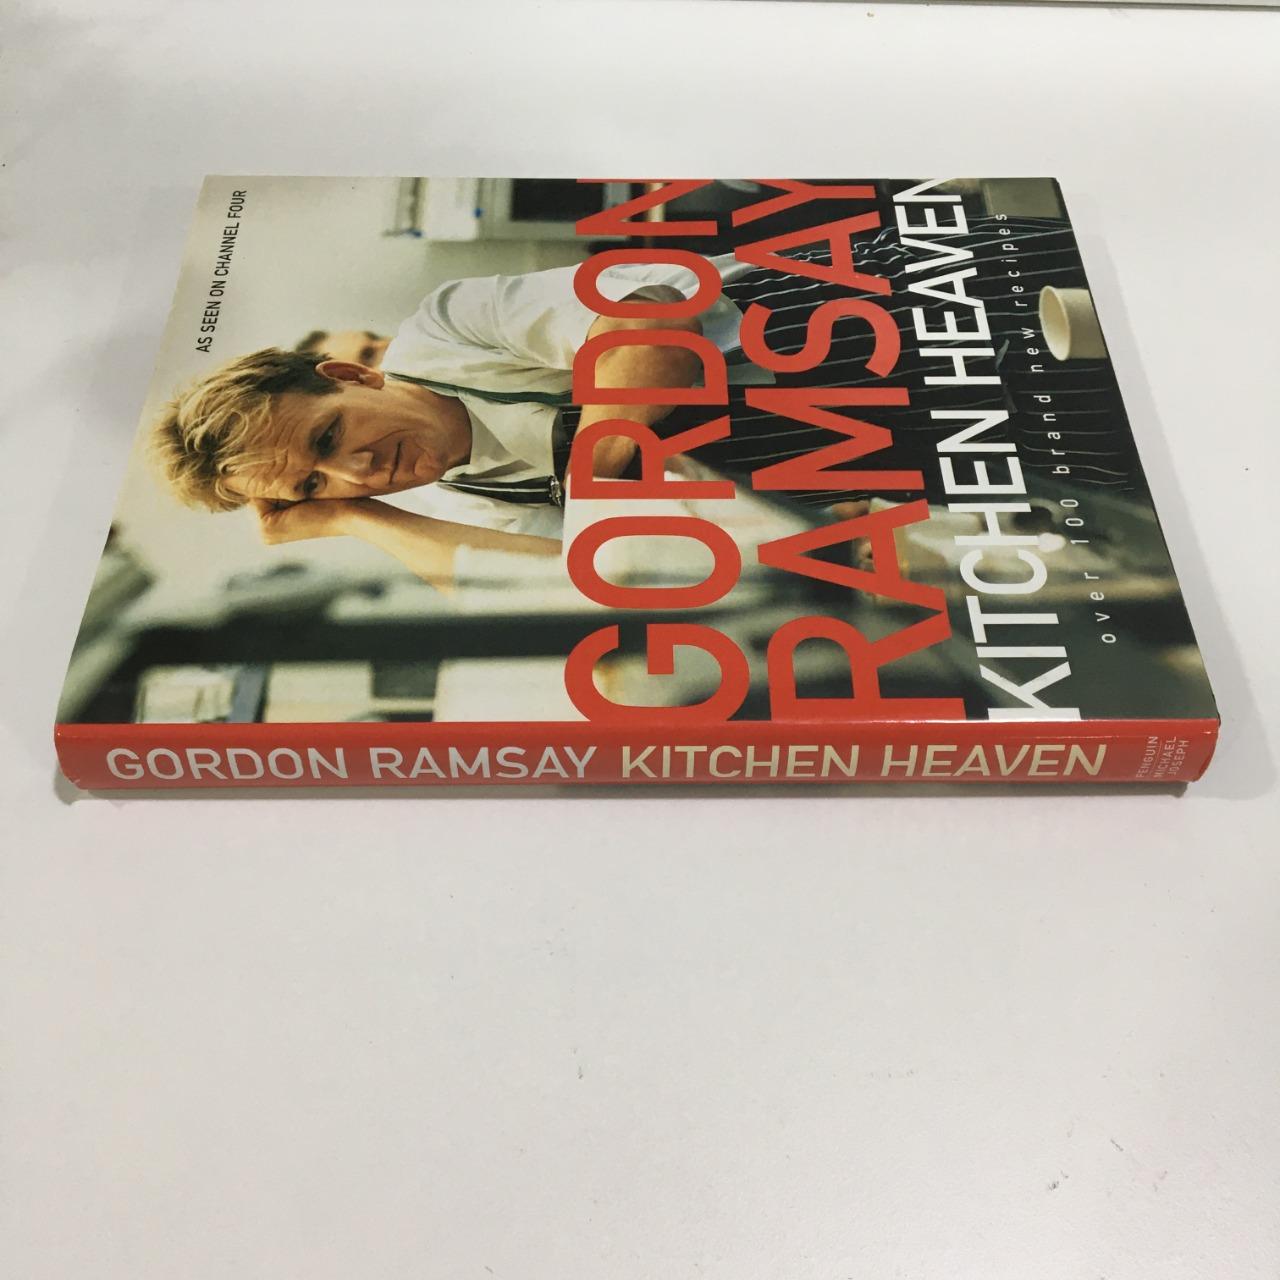 Gordon Ramsay Bundle